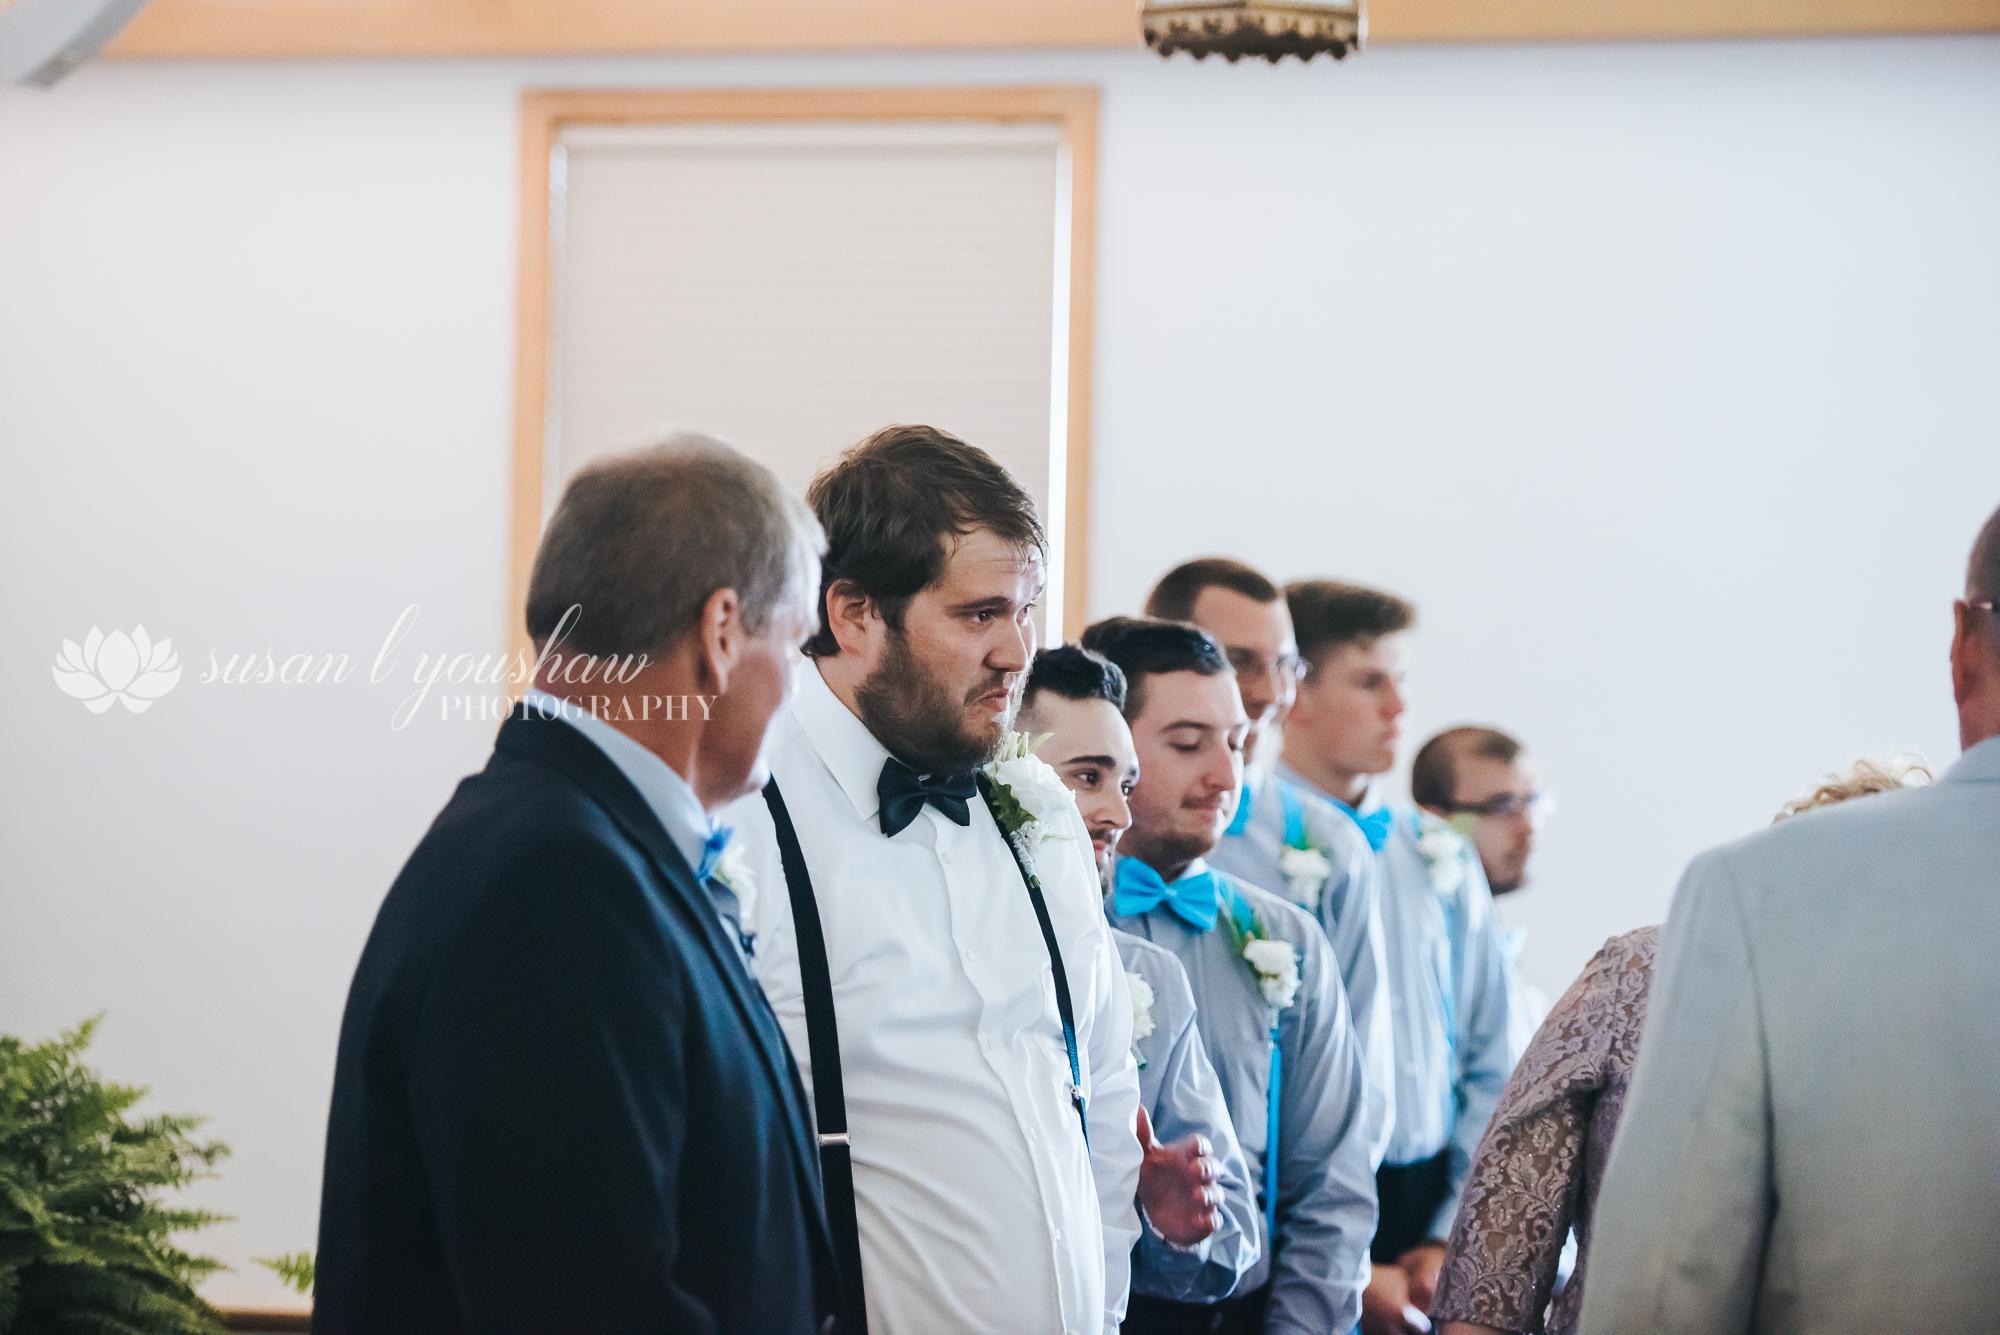 Katelyn and Wes Wedding Photos 07-13-2019 SLY Photography-48.jpg